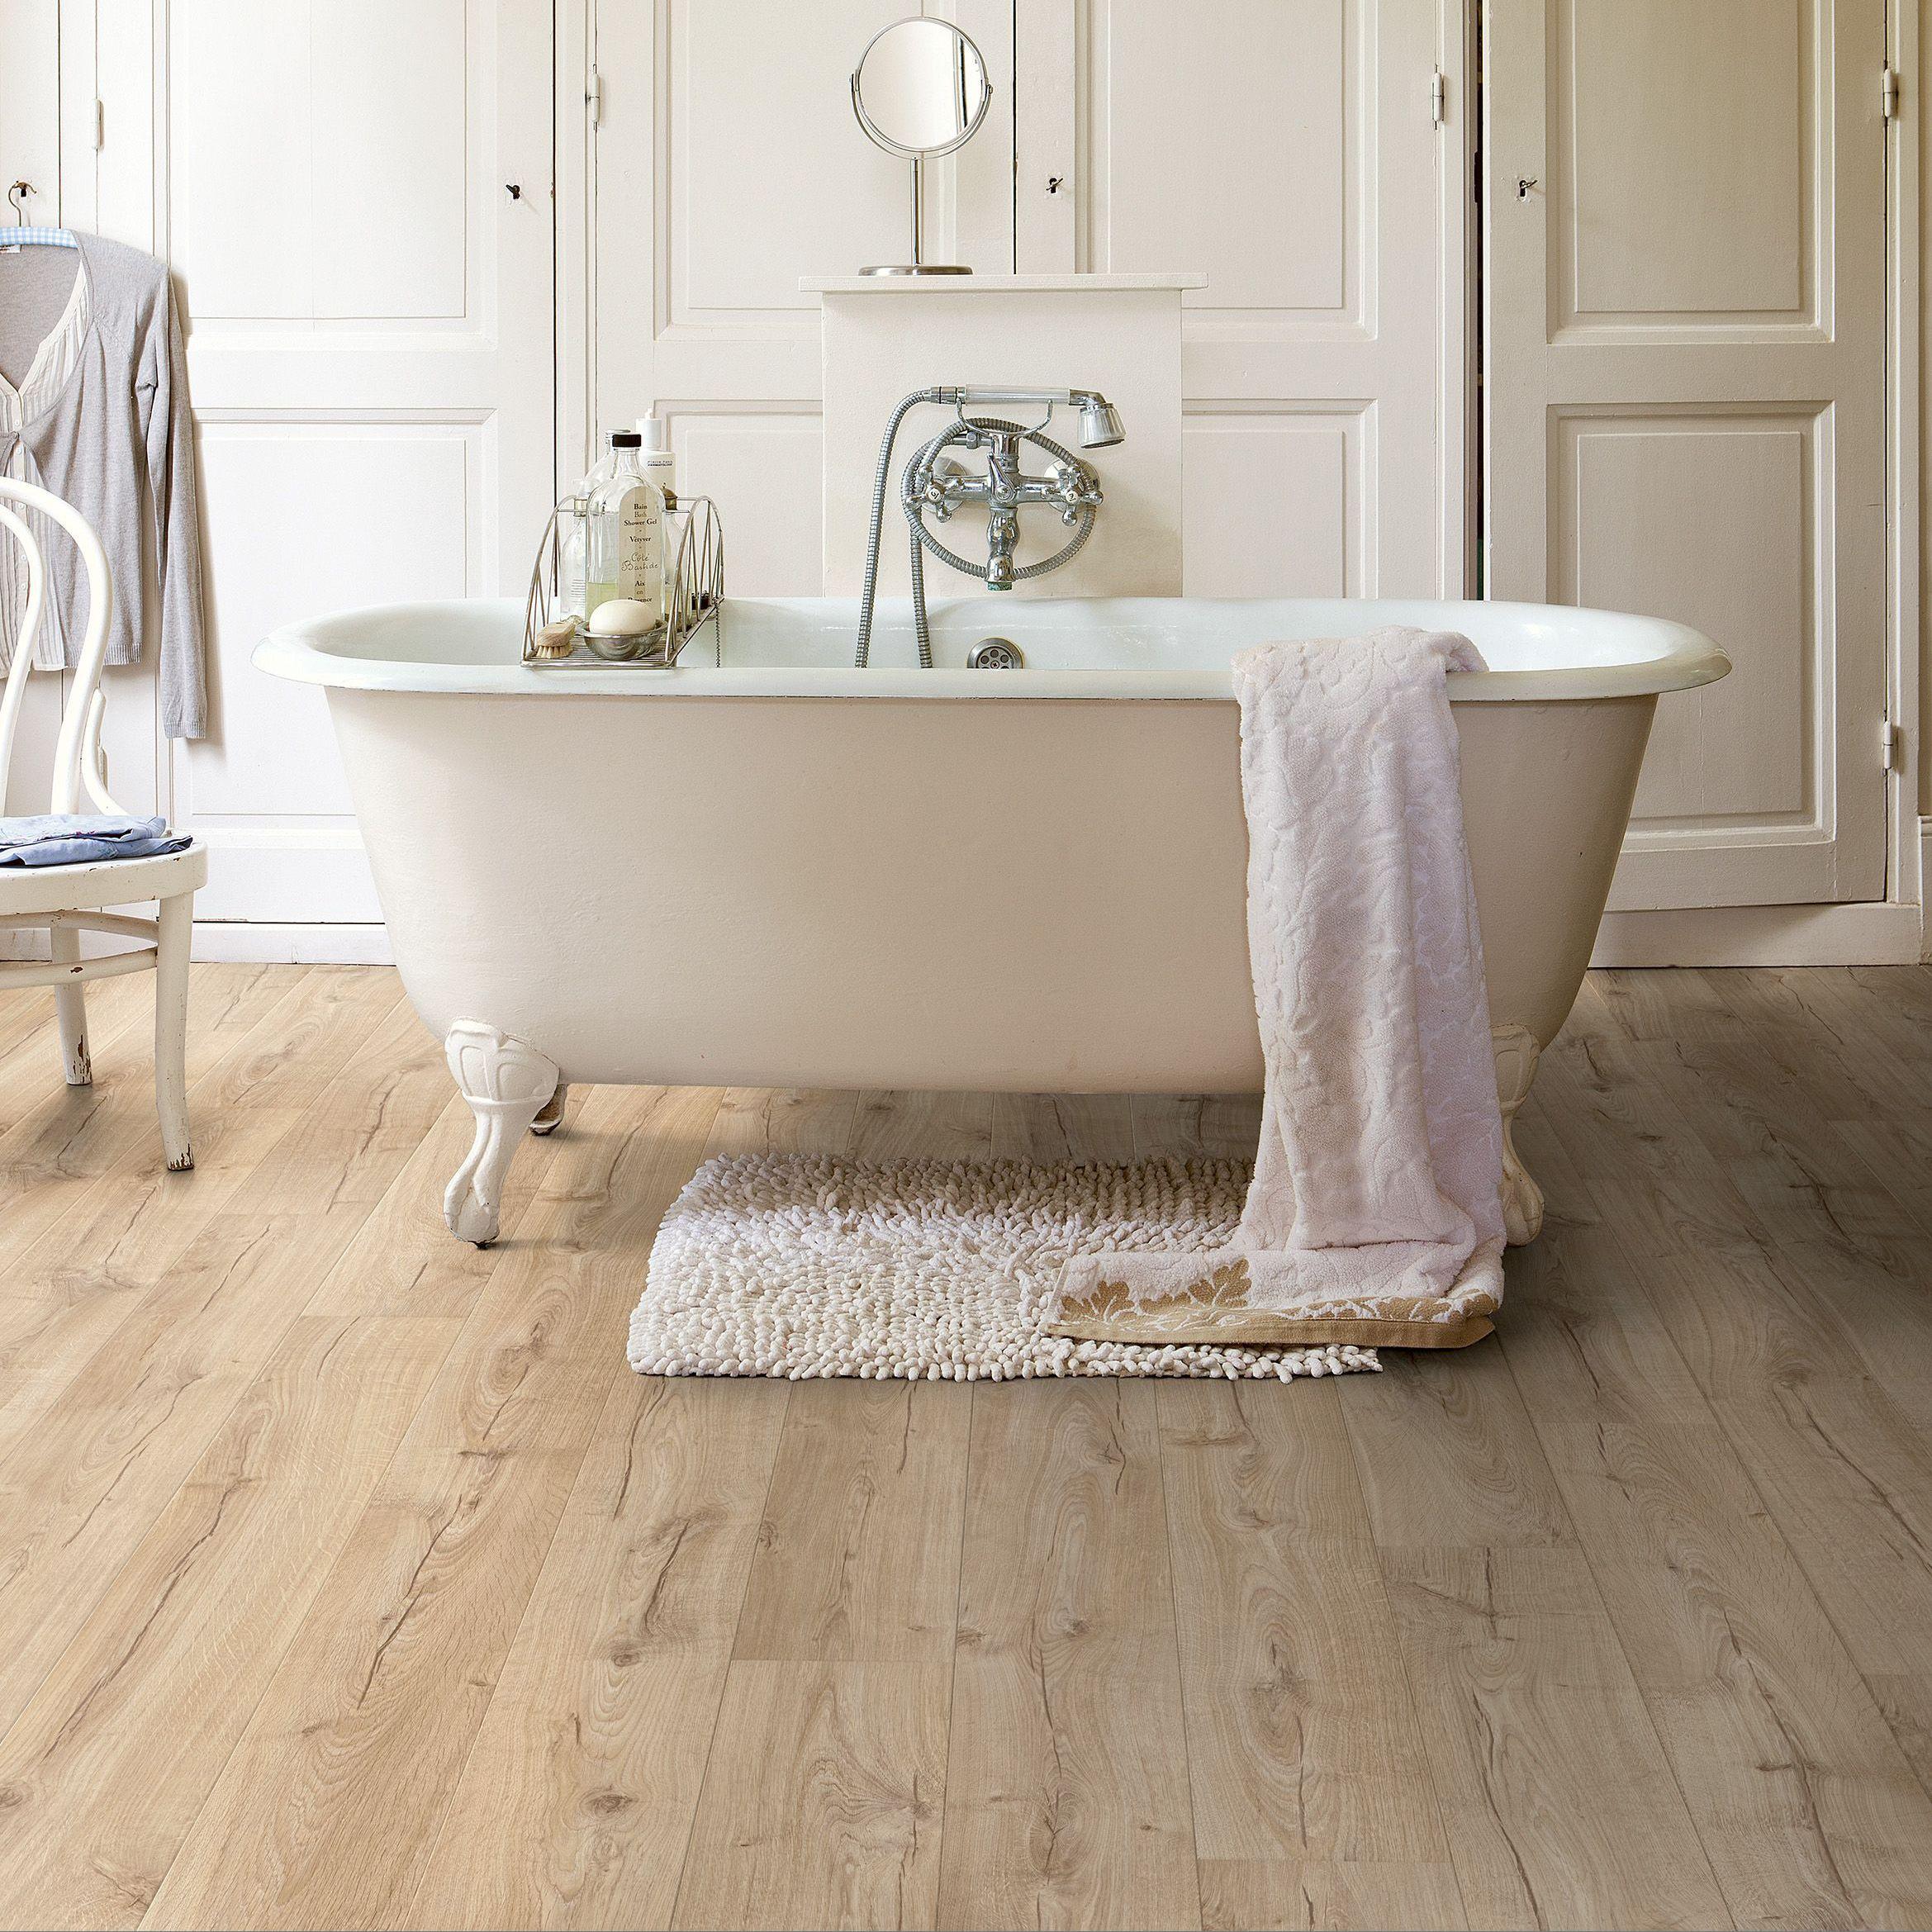 Quickstep Aquanto Beige Oak Effect Laminate Flooring 1 835 M² Pack Departments Diy At B Q